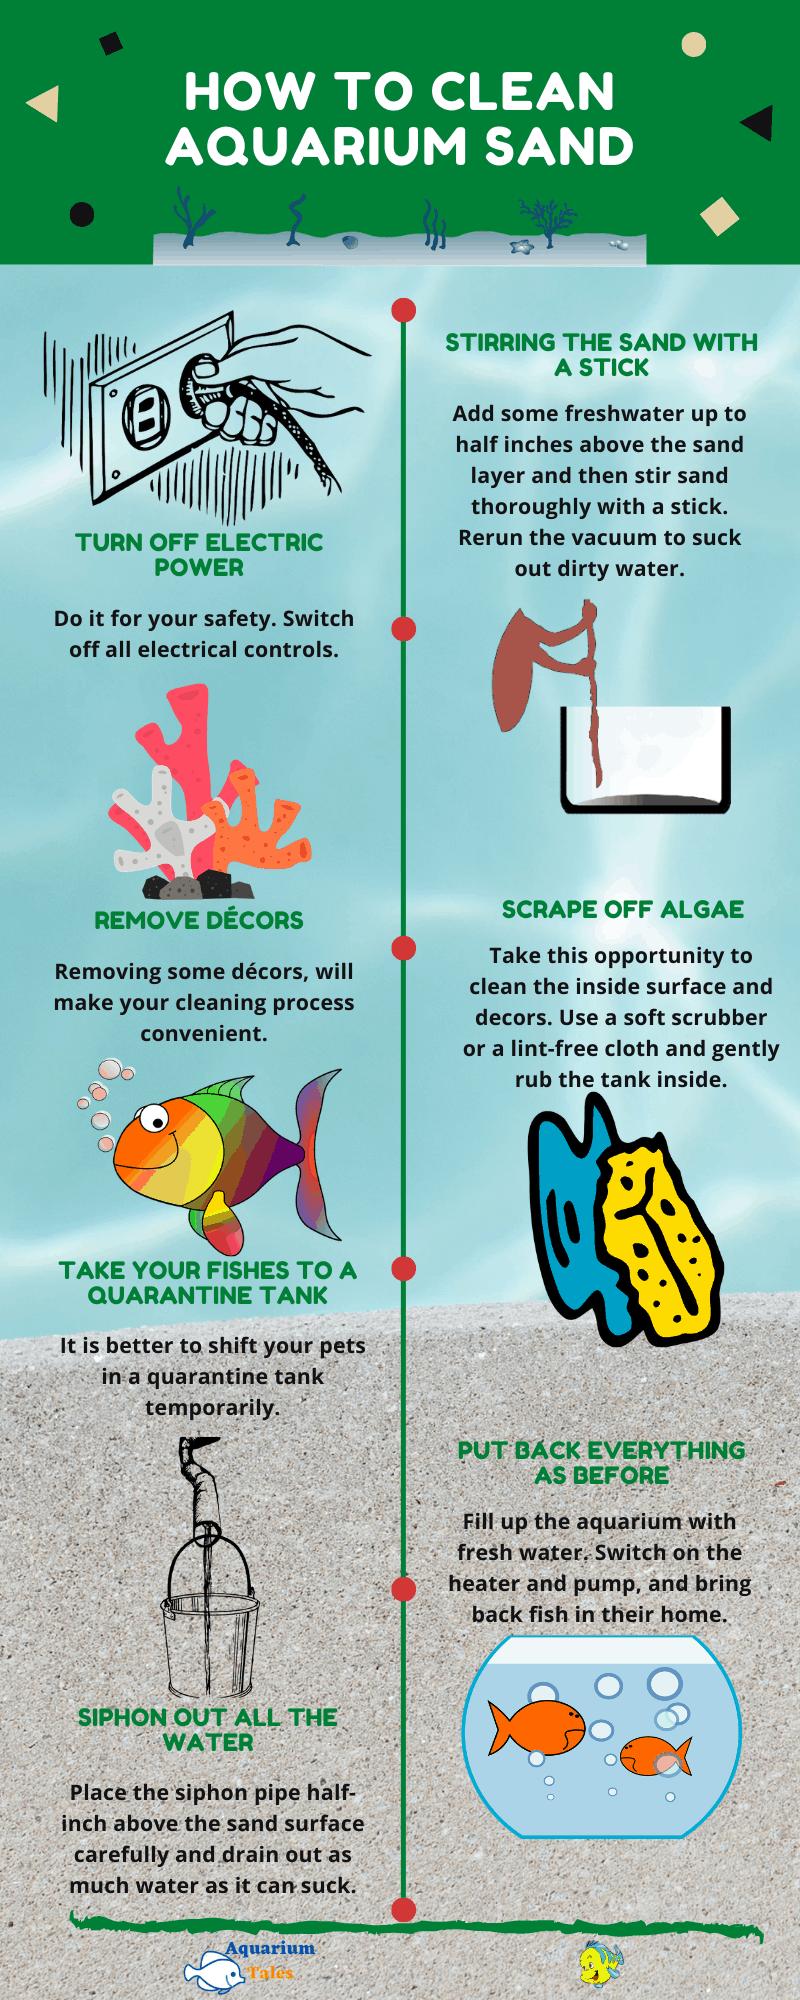 How to Clean Aquarium Sand Thoroughly